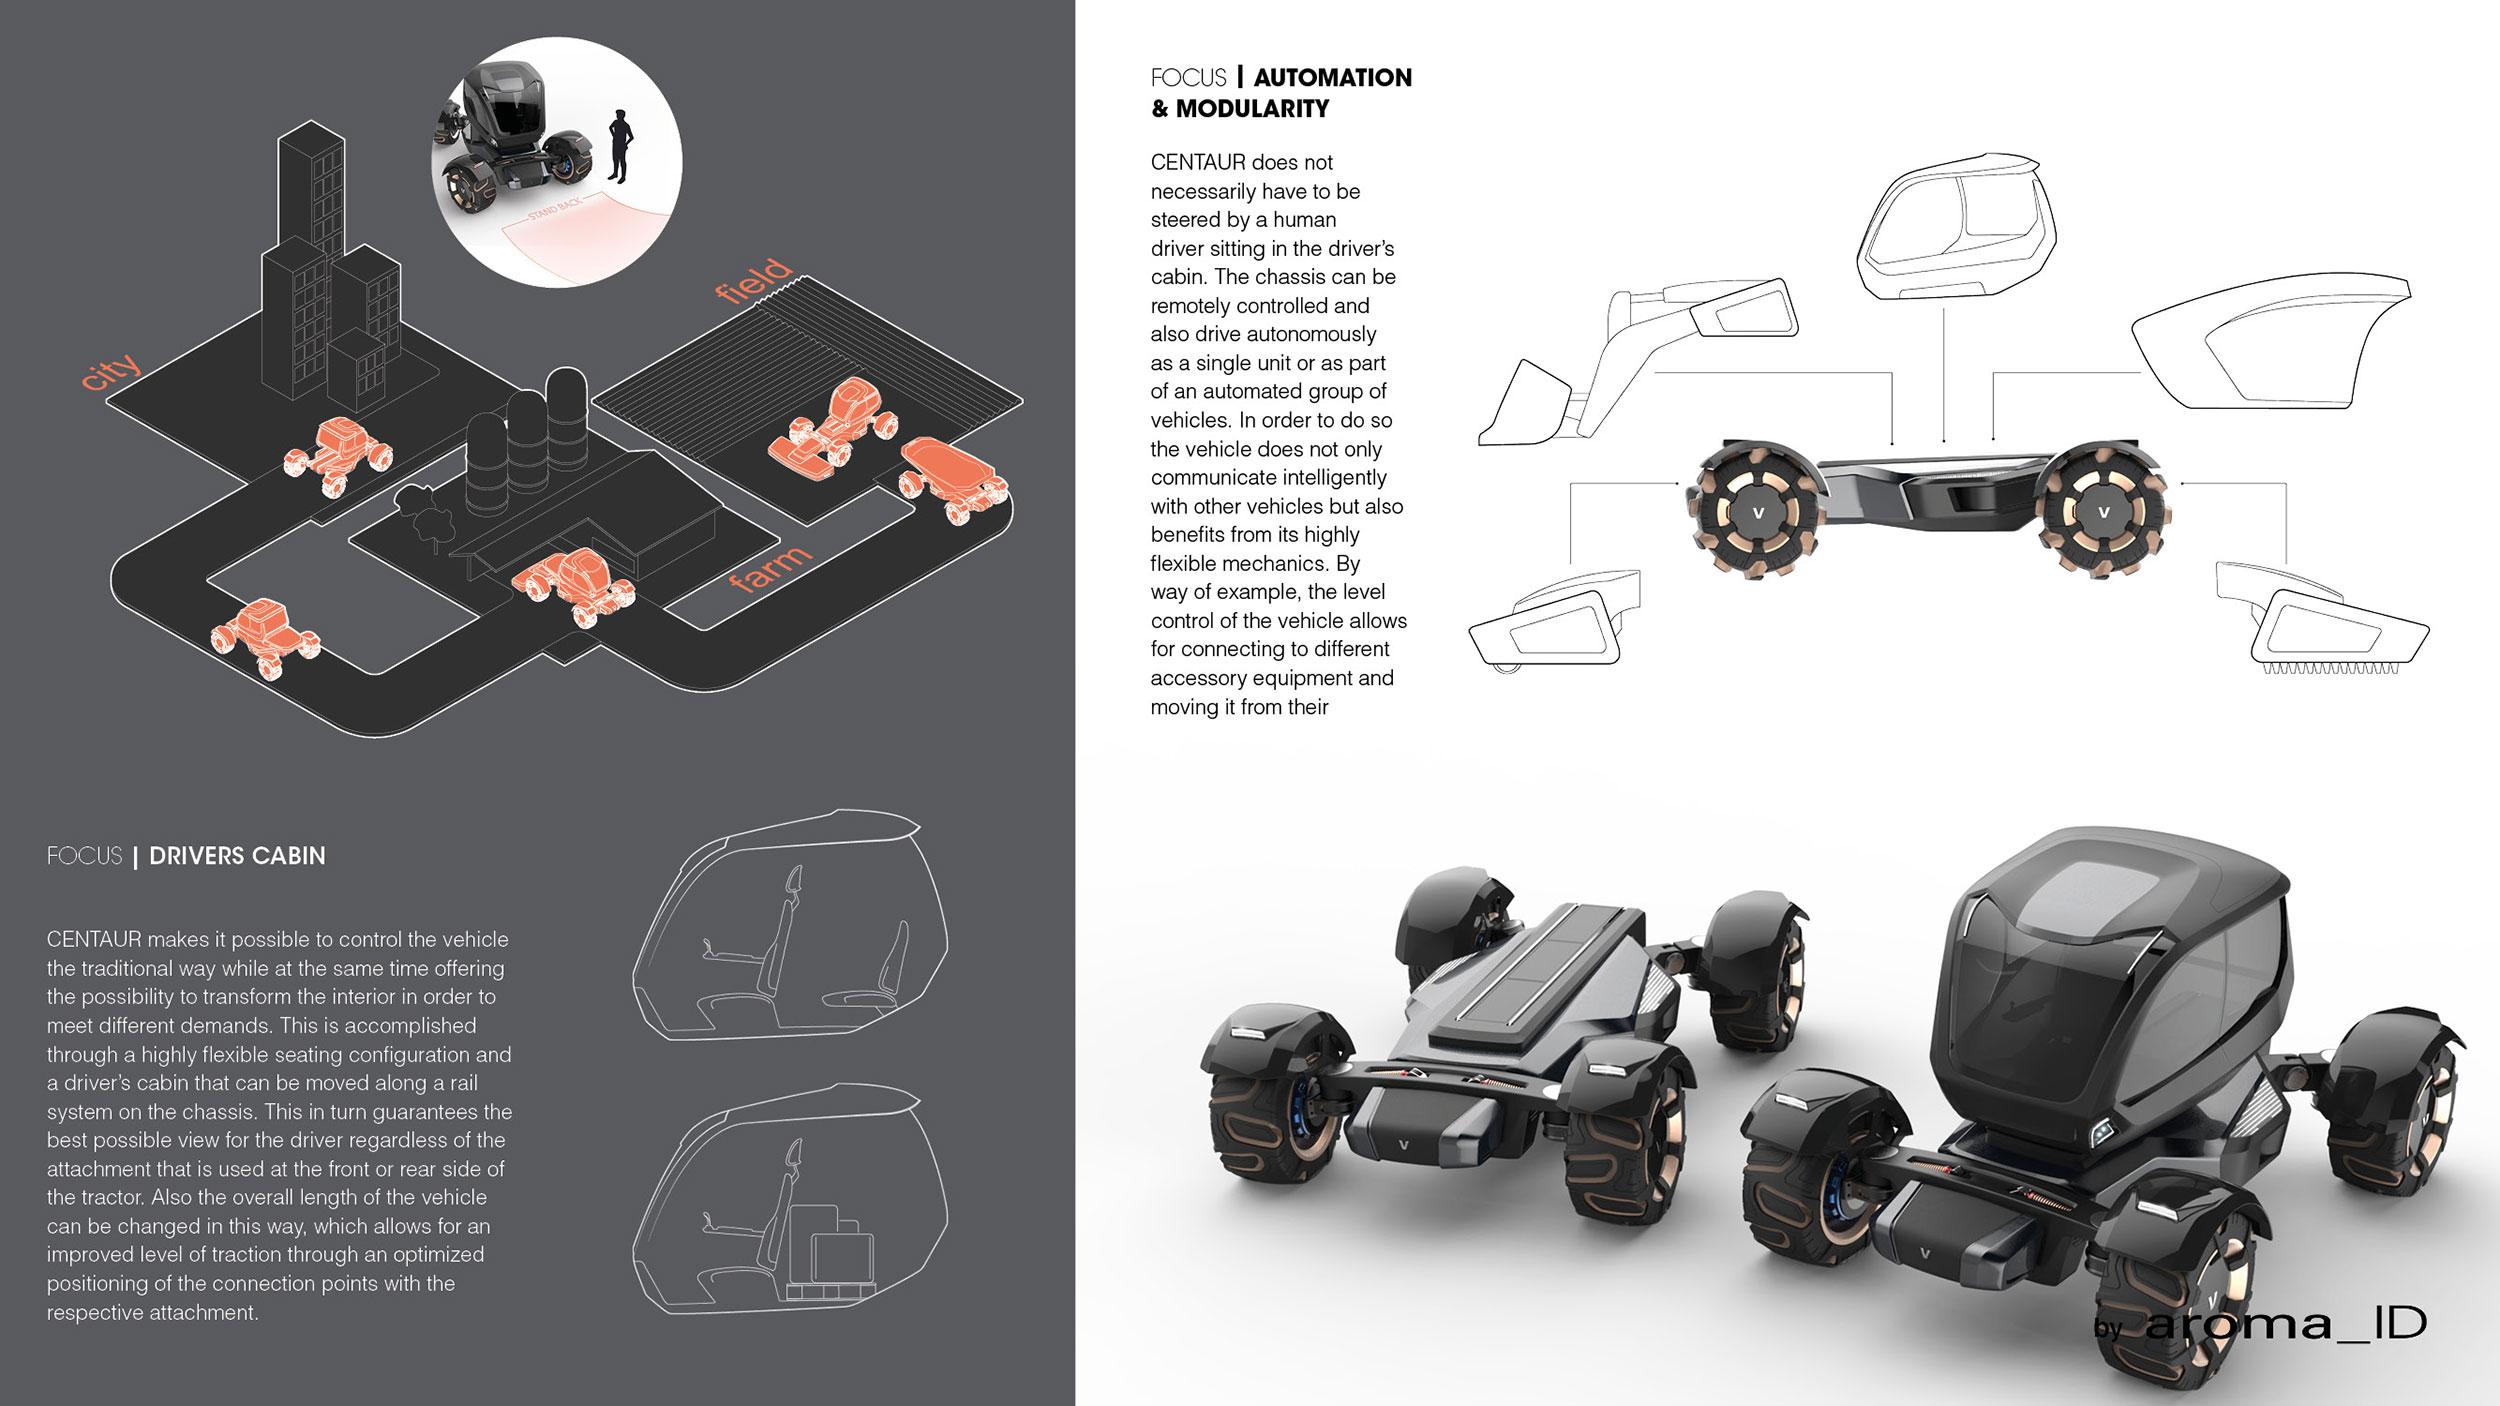 Valtra_Designchallenge_Concept_CENTAUR_by_aroma_ID_3